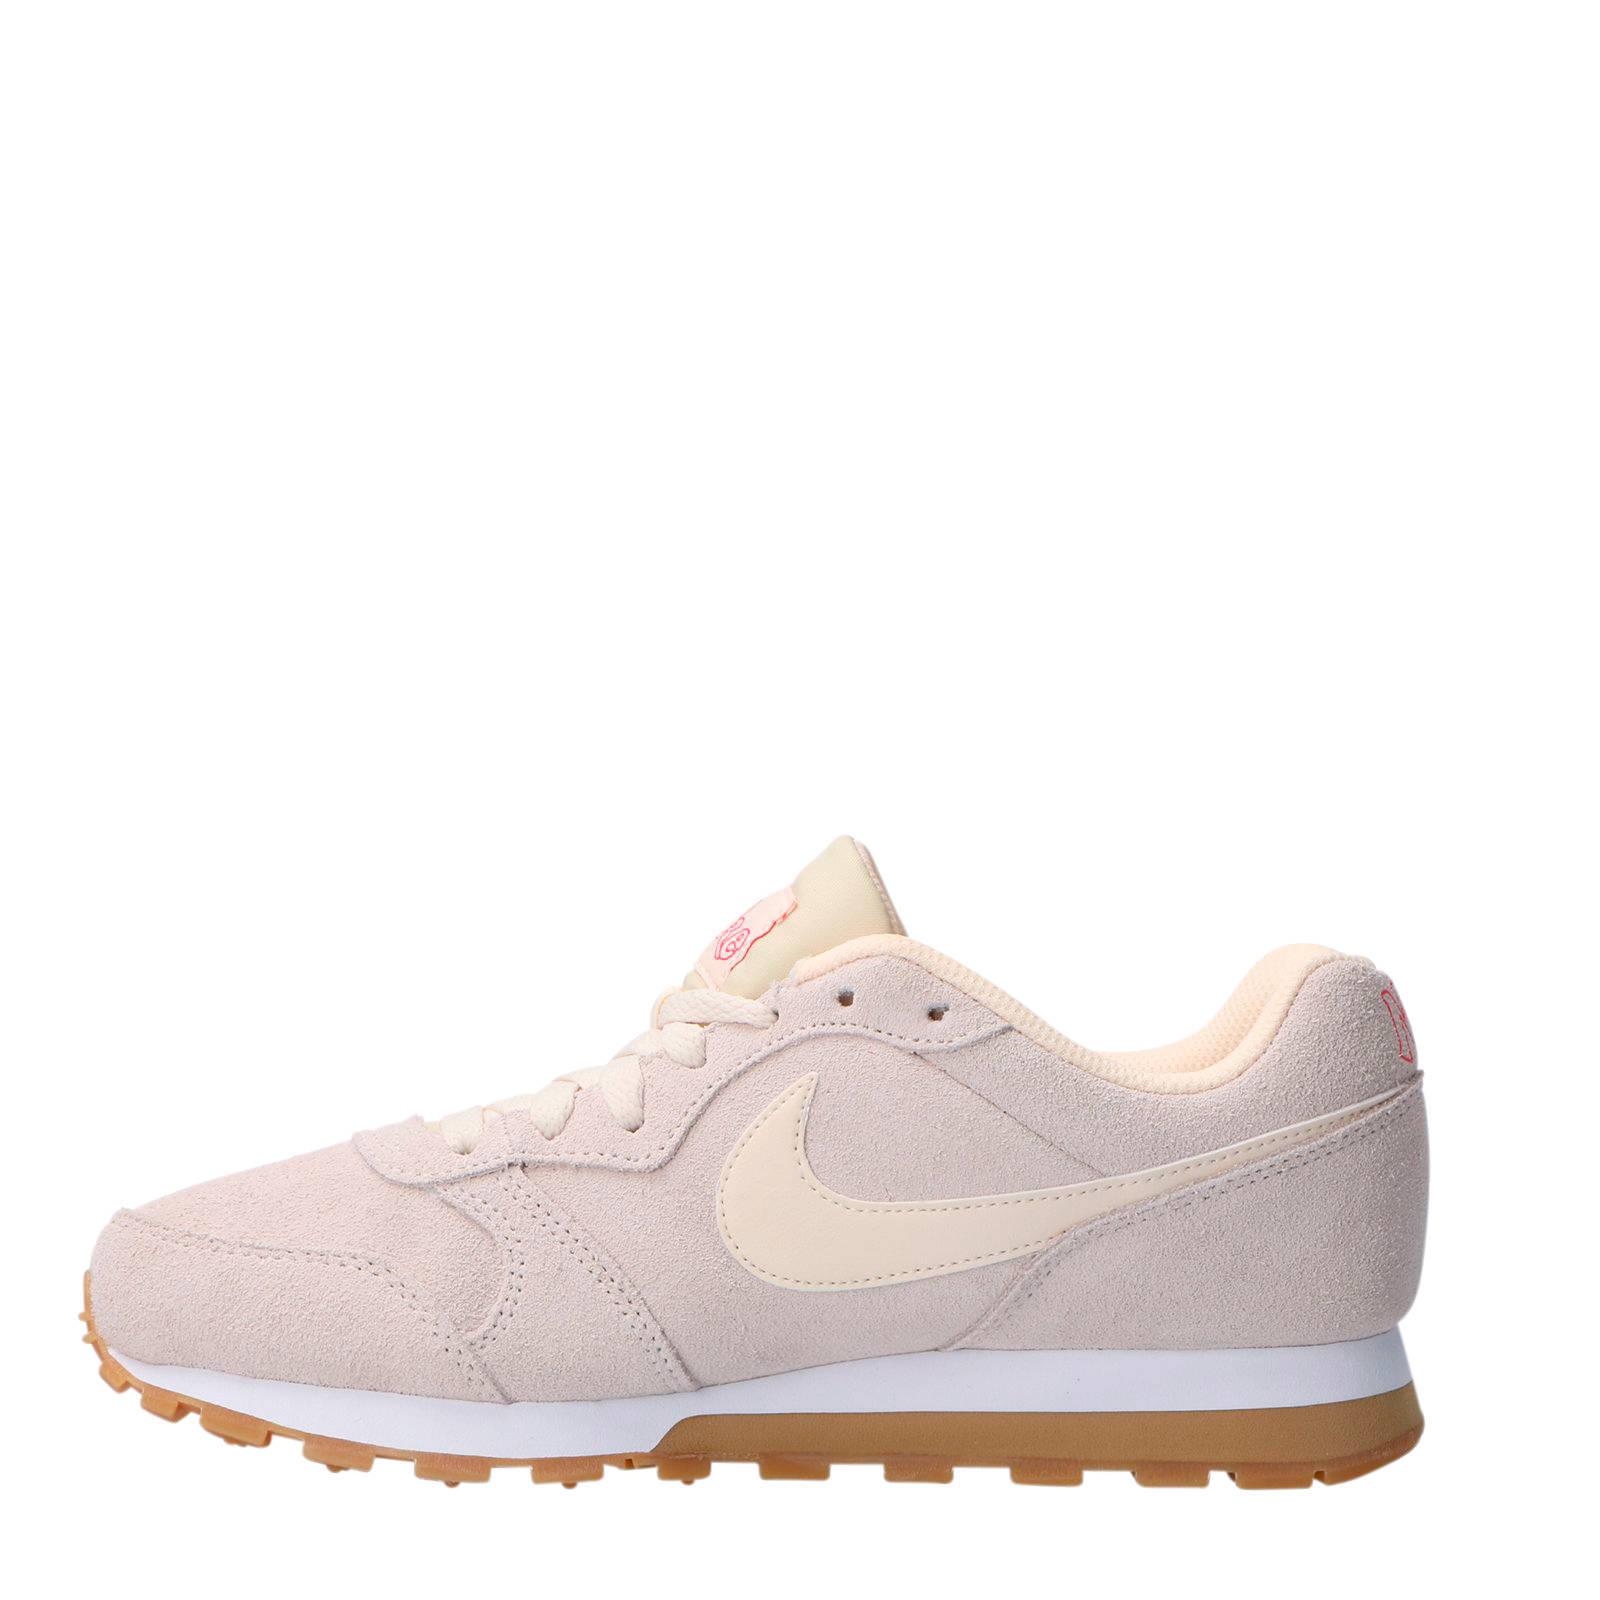 MD Runner 2 SE sneakers ecru